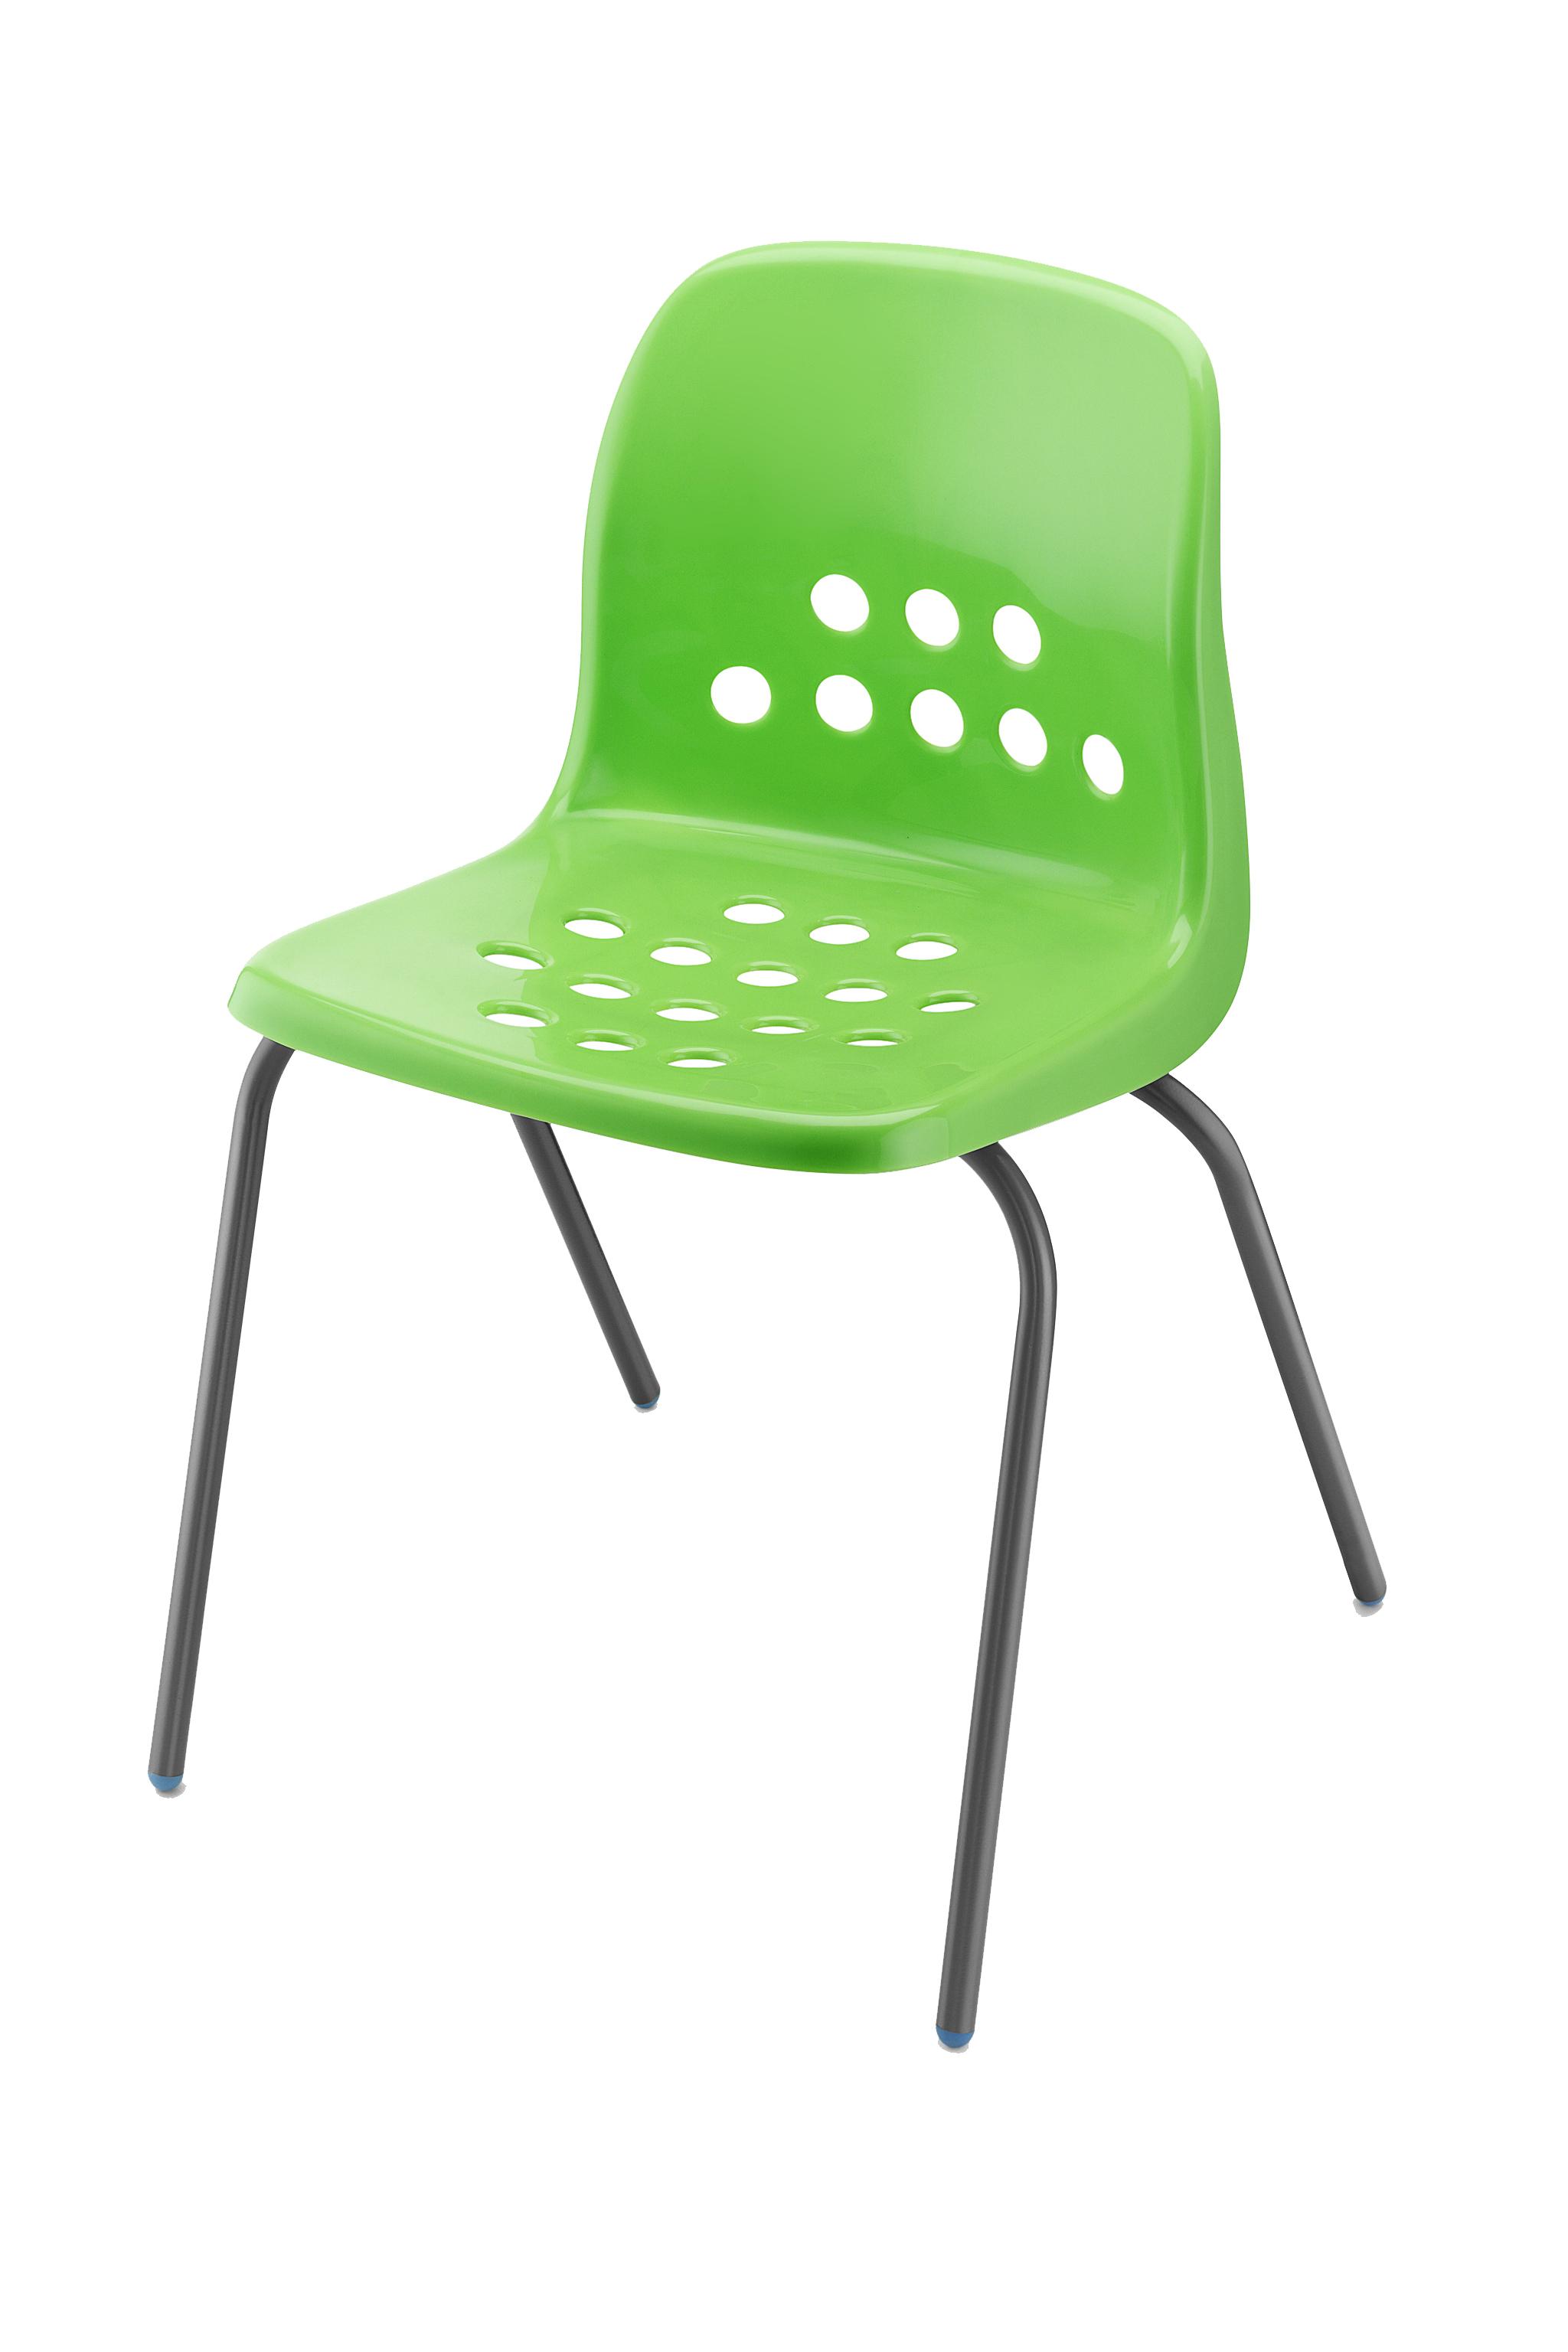 SG2062 green